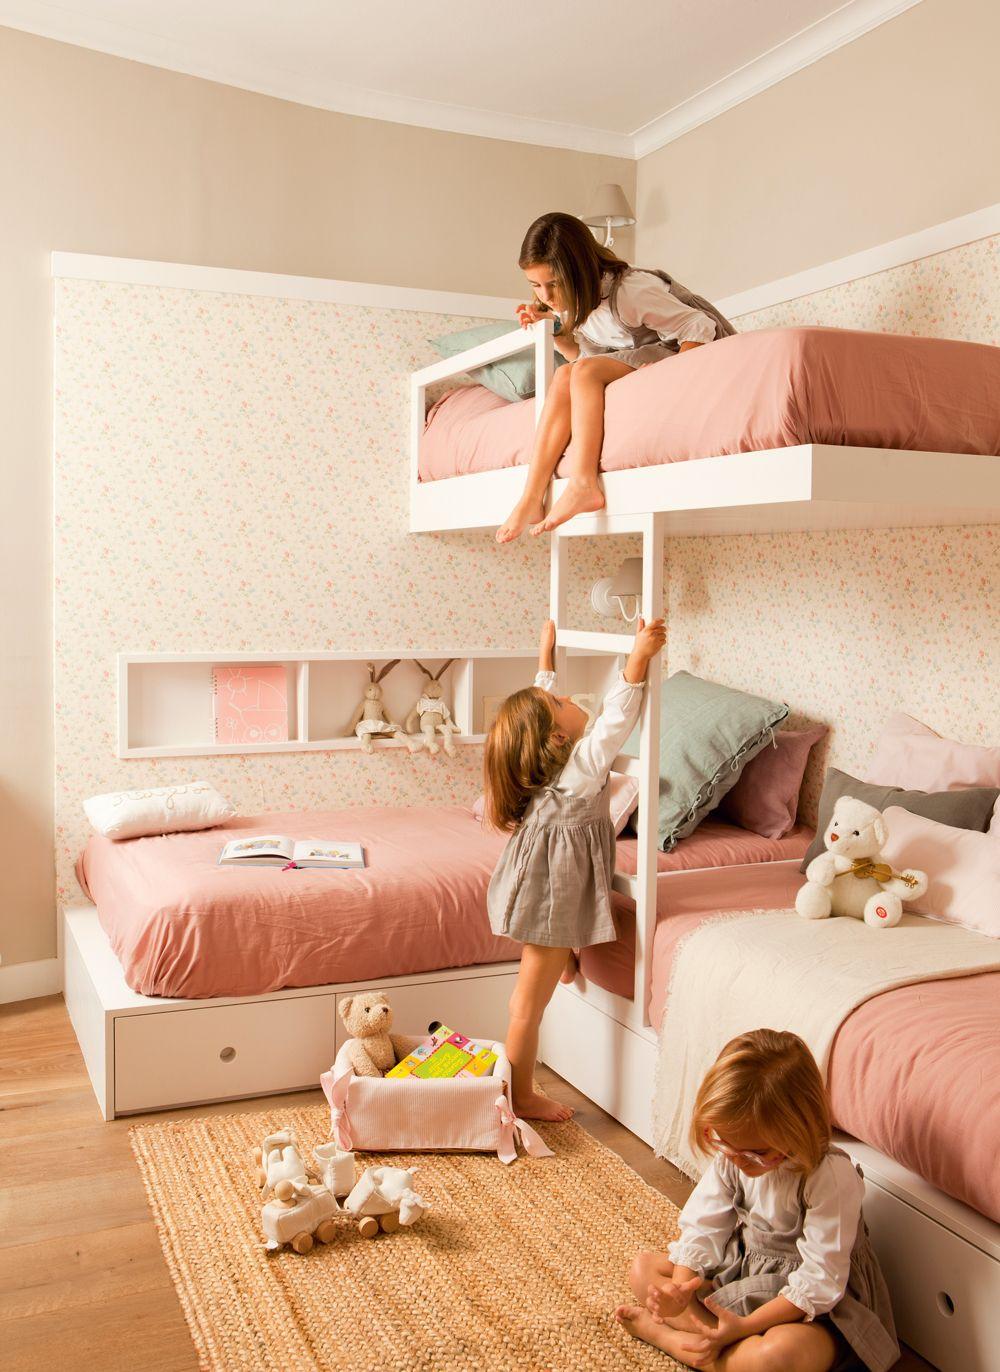 Habitaci n infantil con tres literas papel pintado y - Habitaciones con papel pintado ...